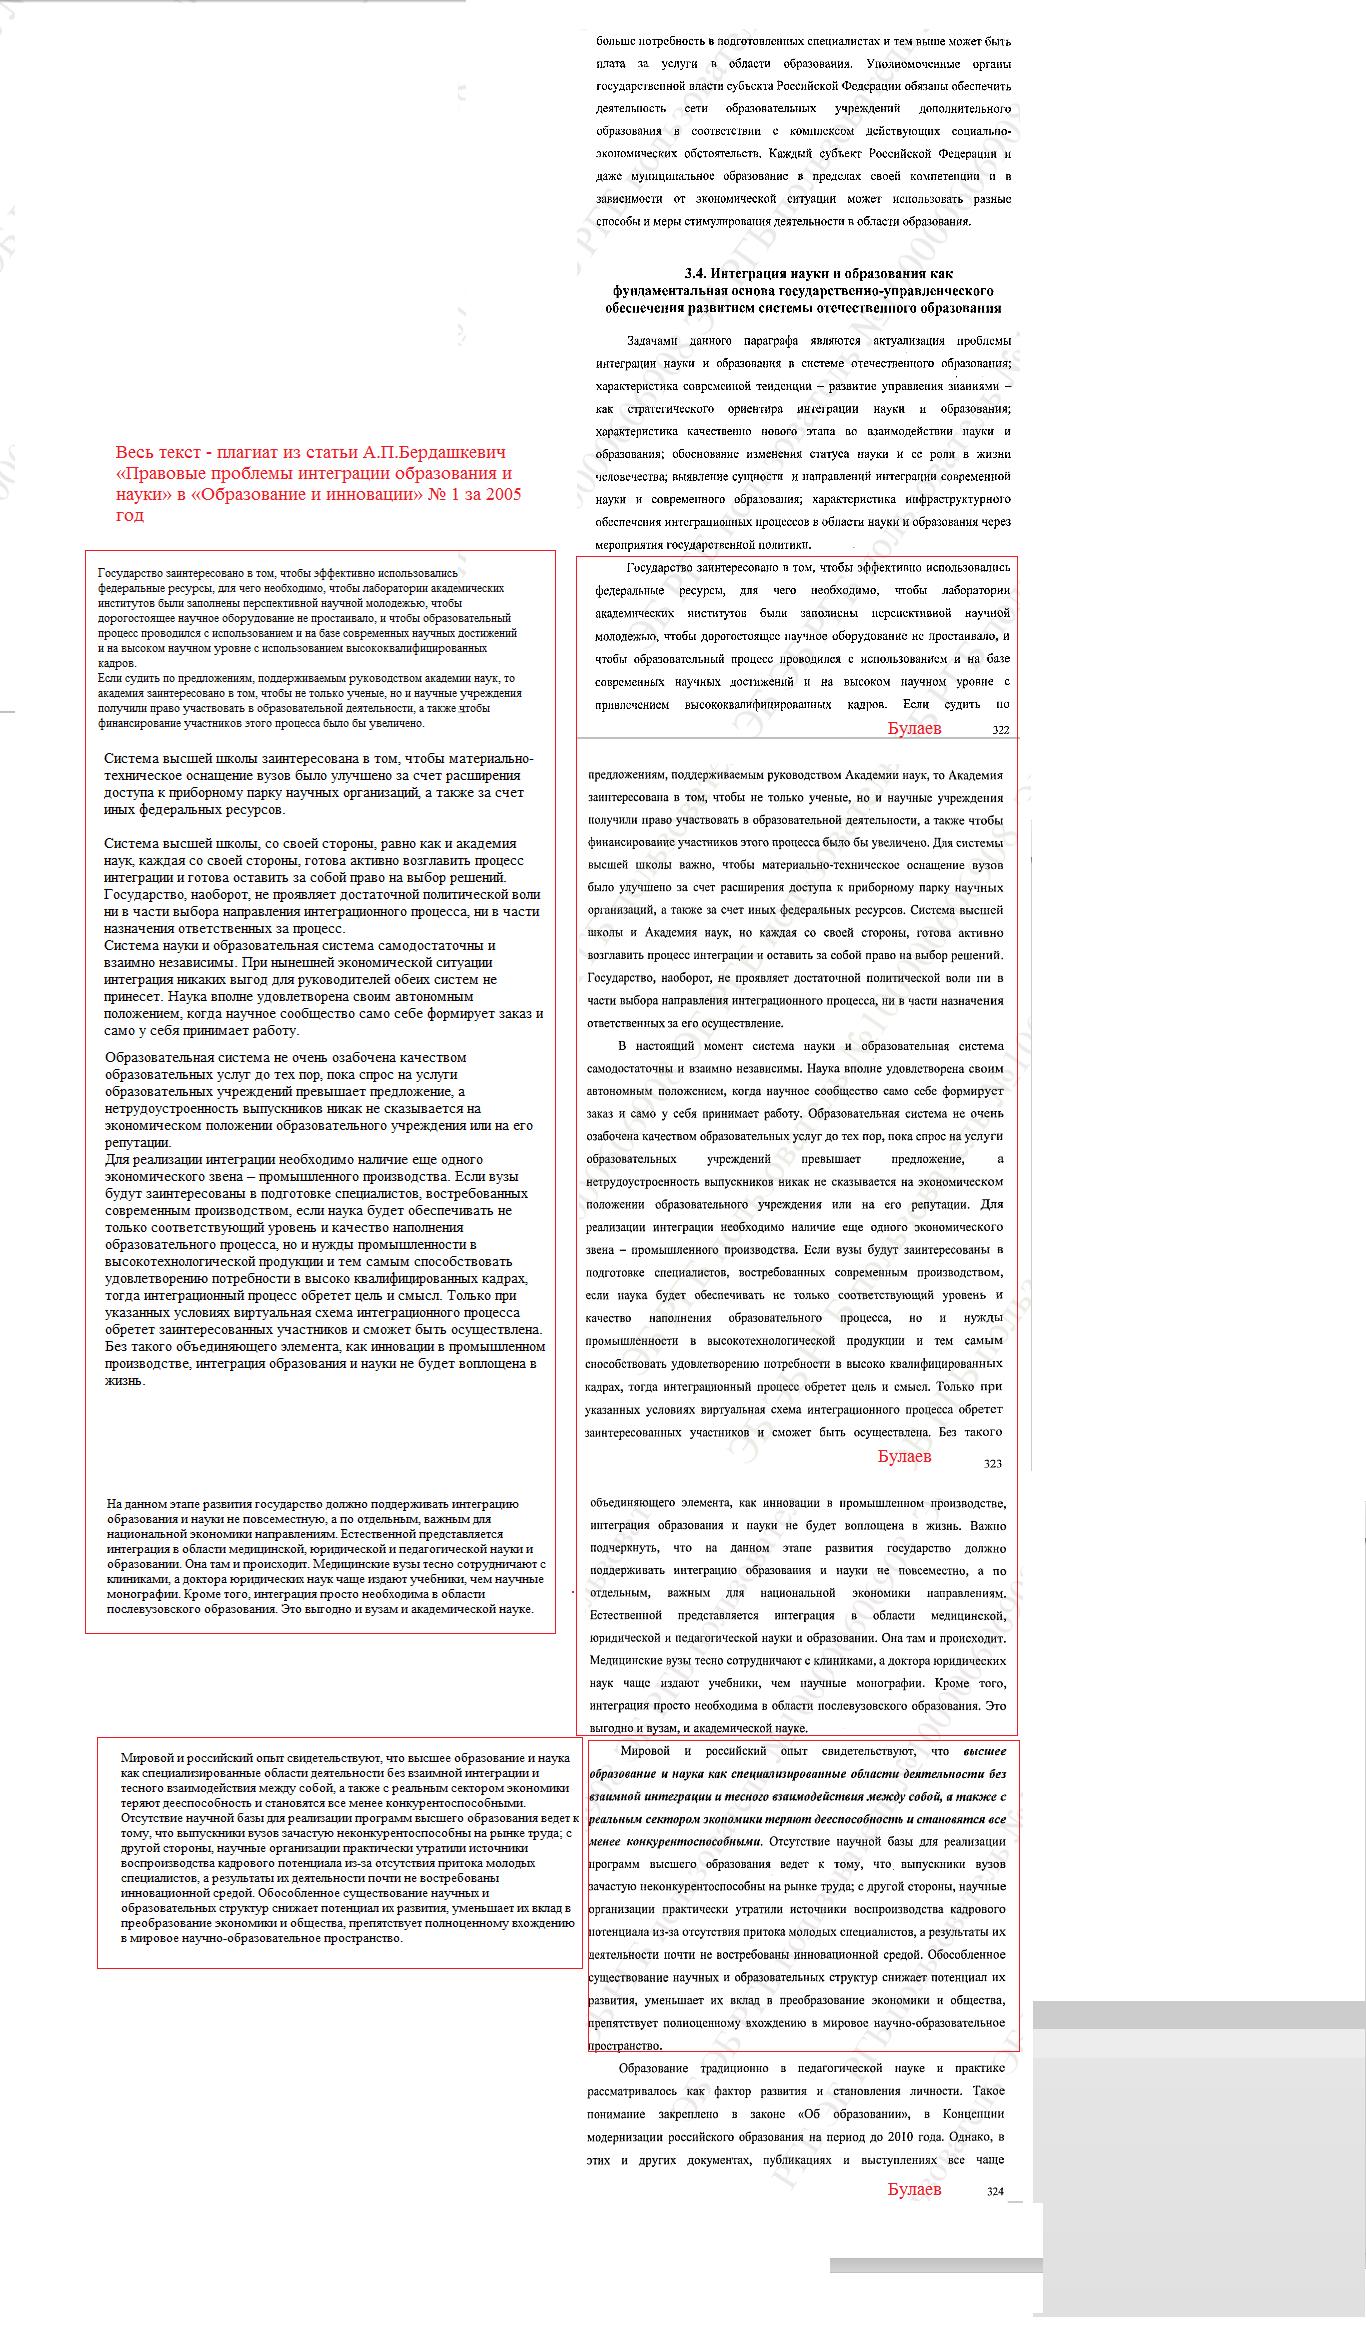 Berdashkevich-Bulaev-322-324